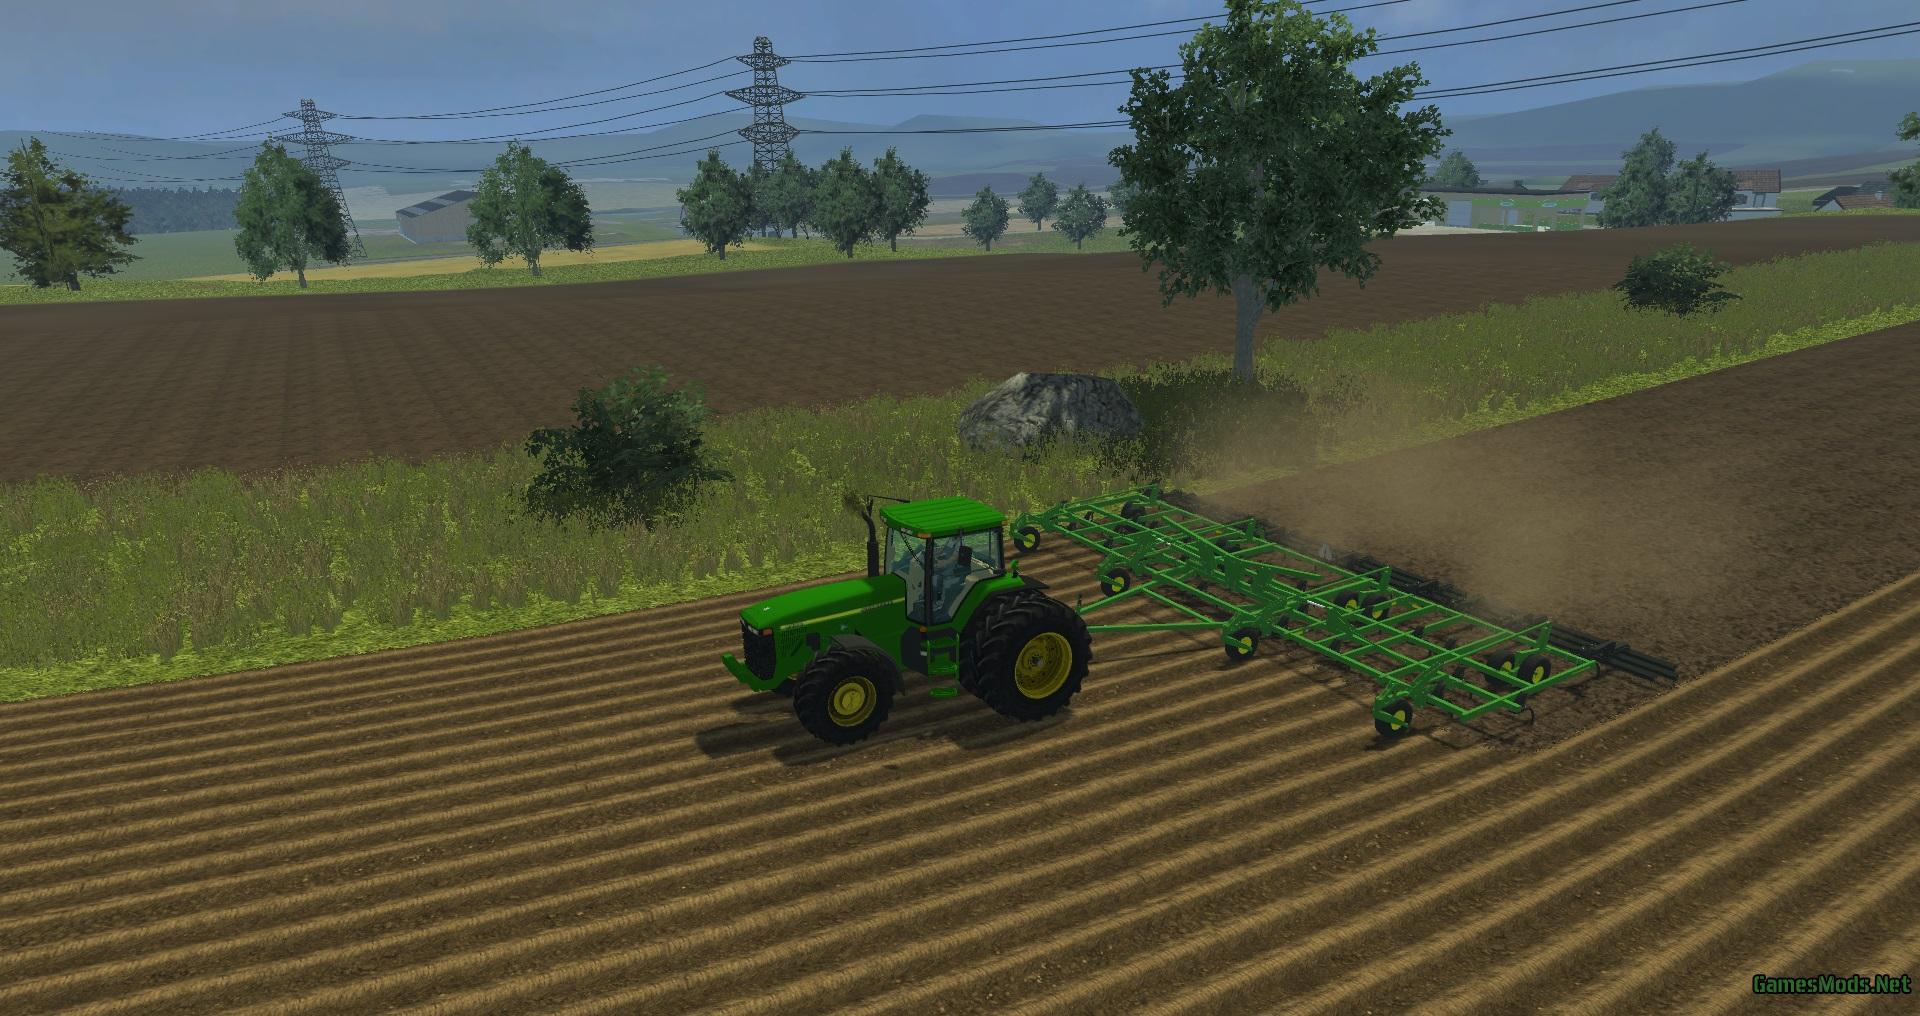 John Deere 2410 Chisel Plow » GamesMods net - FS19, FS17, ETS 2 mods